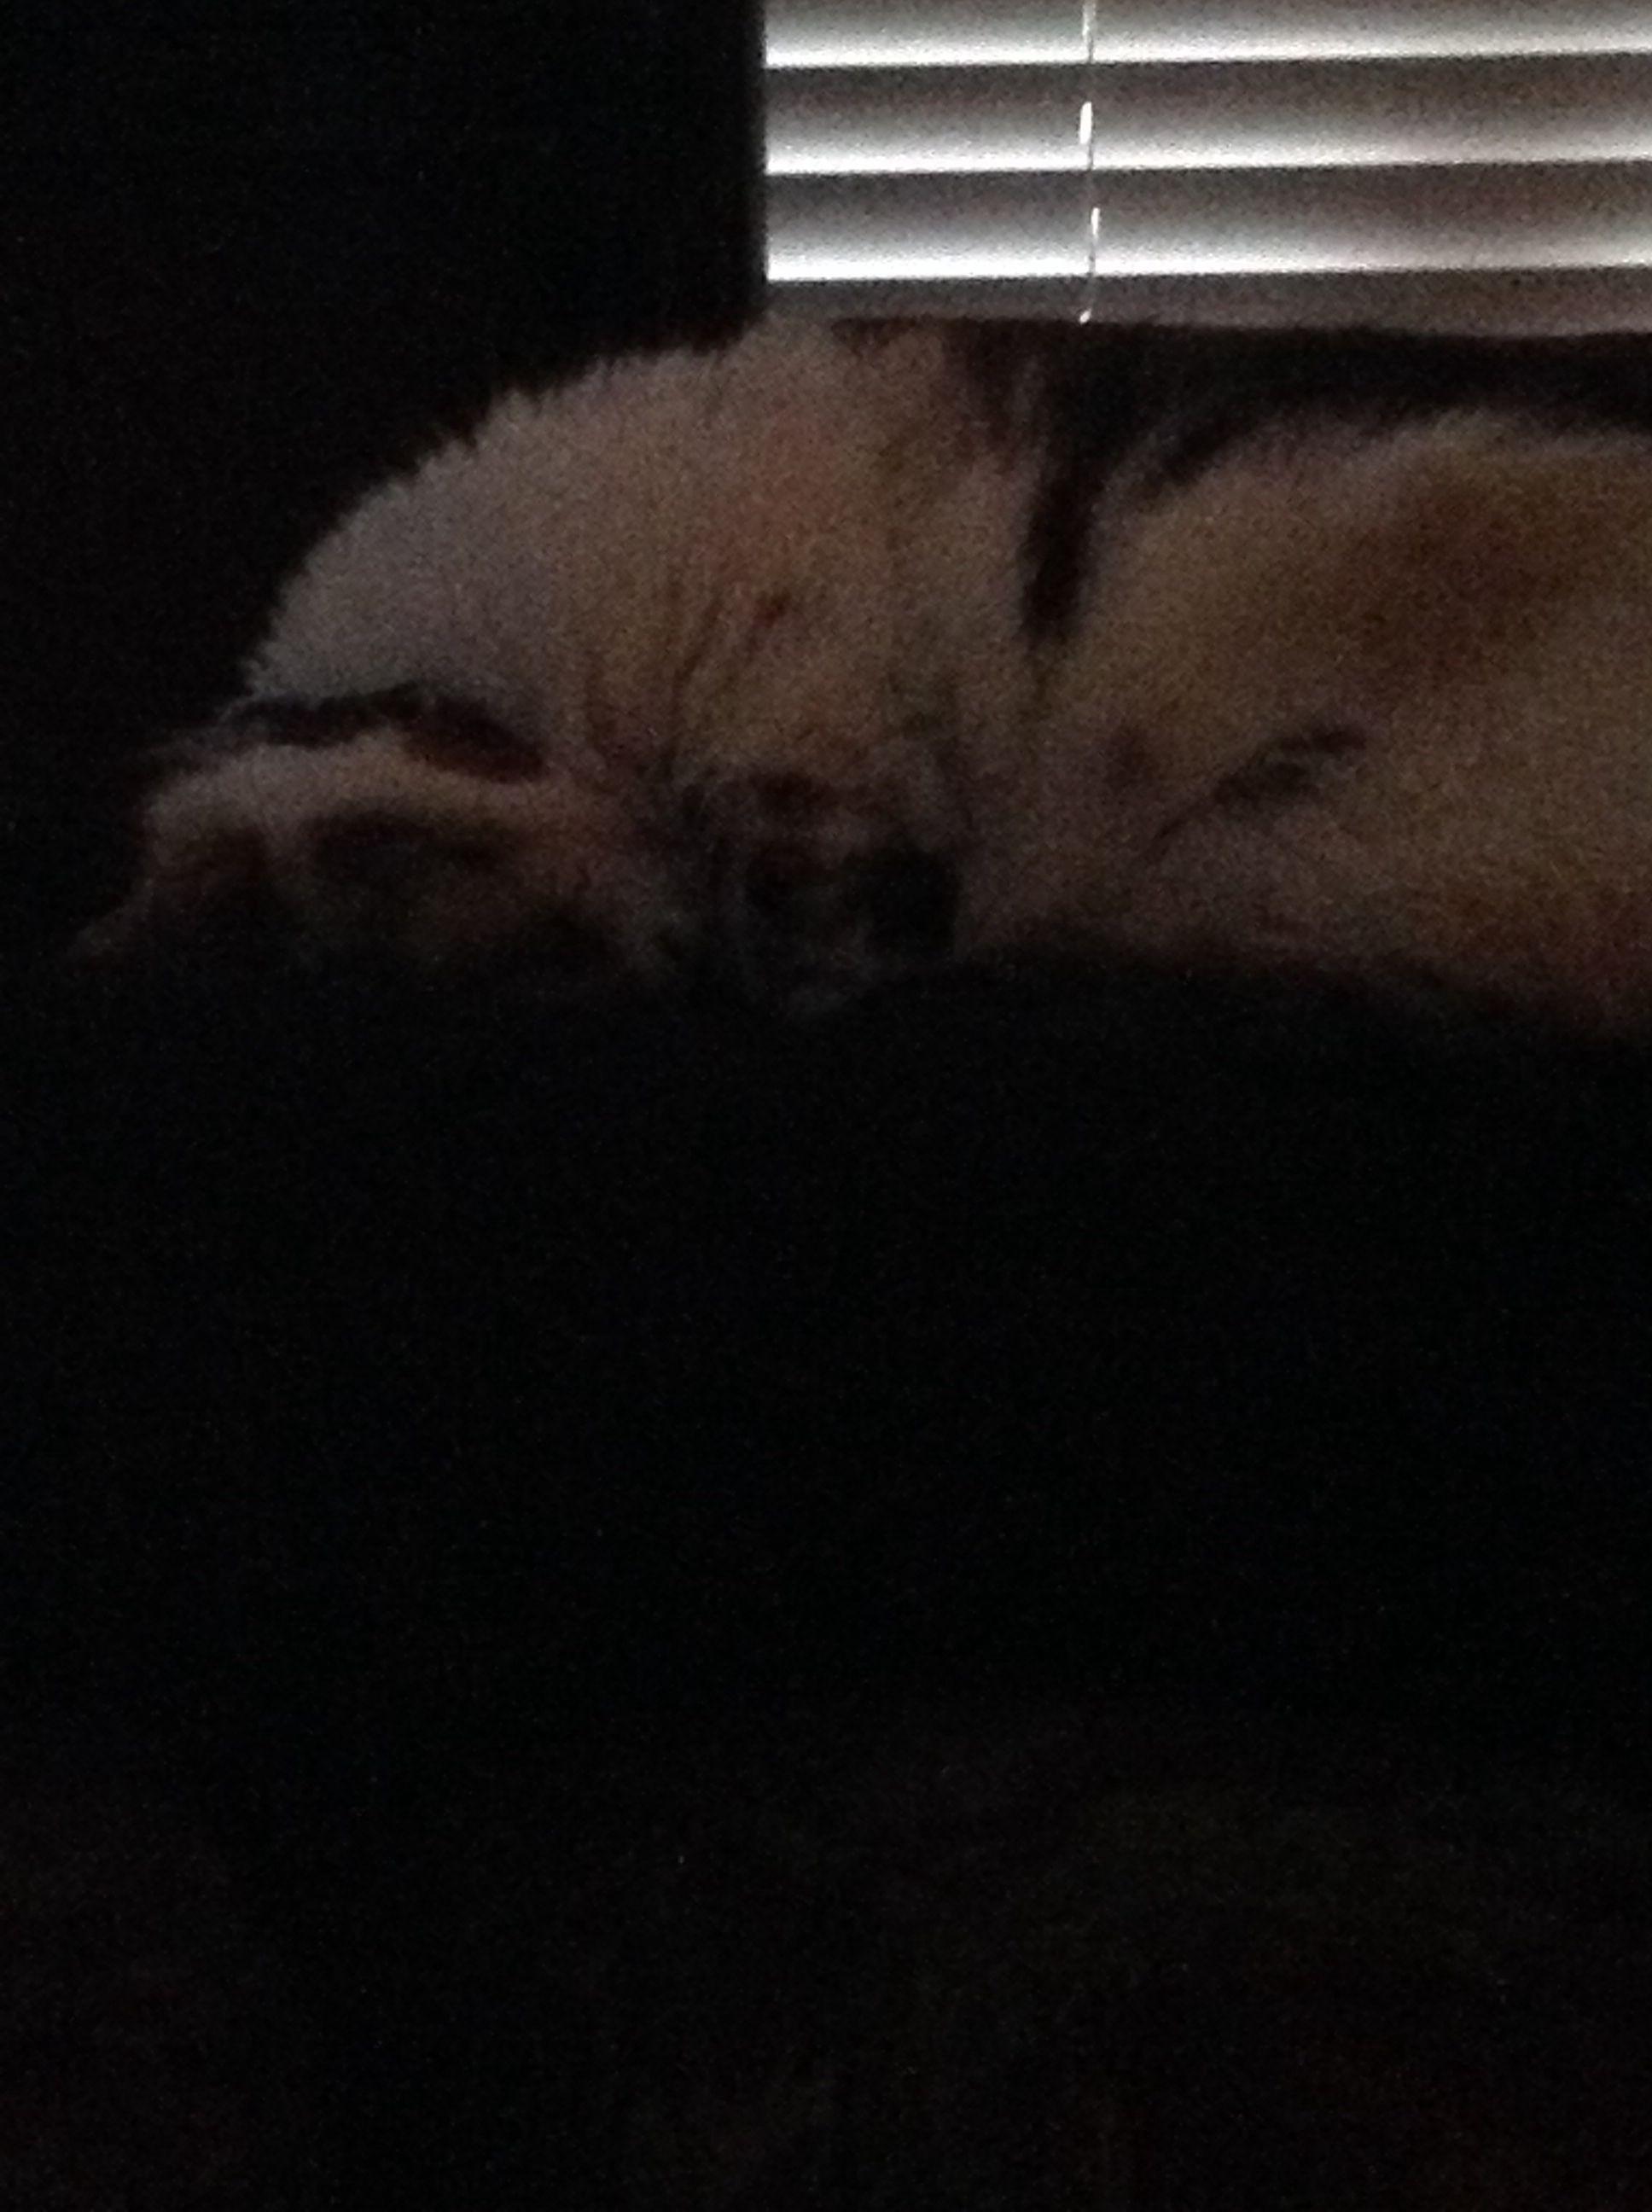 My Cat Sleeps On Her Neck Cat Sleeping Beautiful Cat Cats